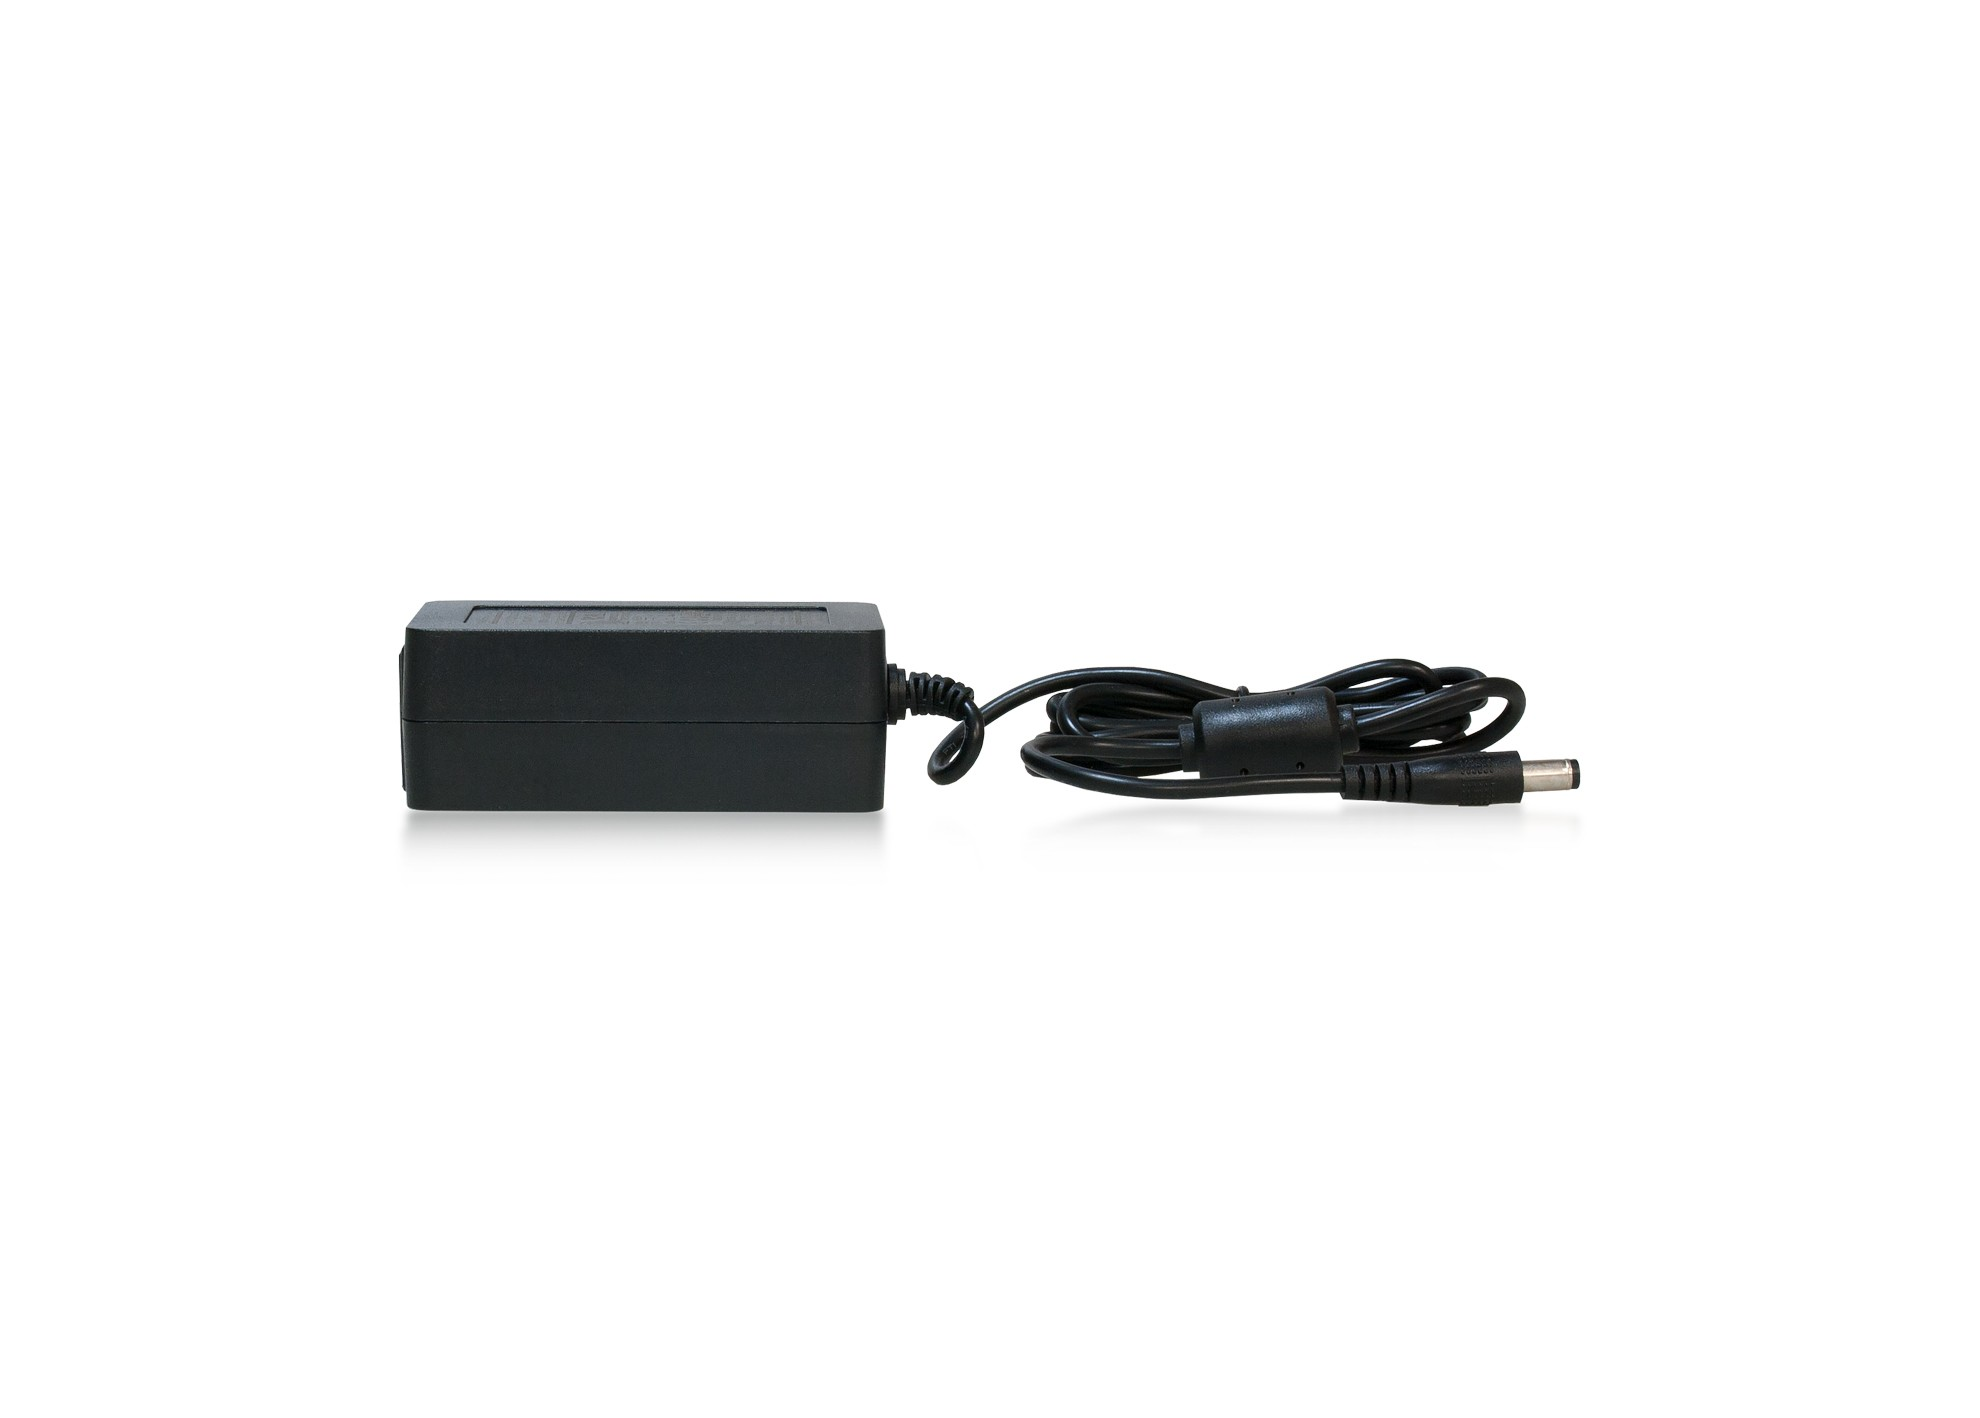 Dreambox TWO UHD 4K (2x DVB-S2X)